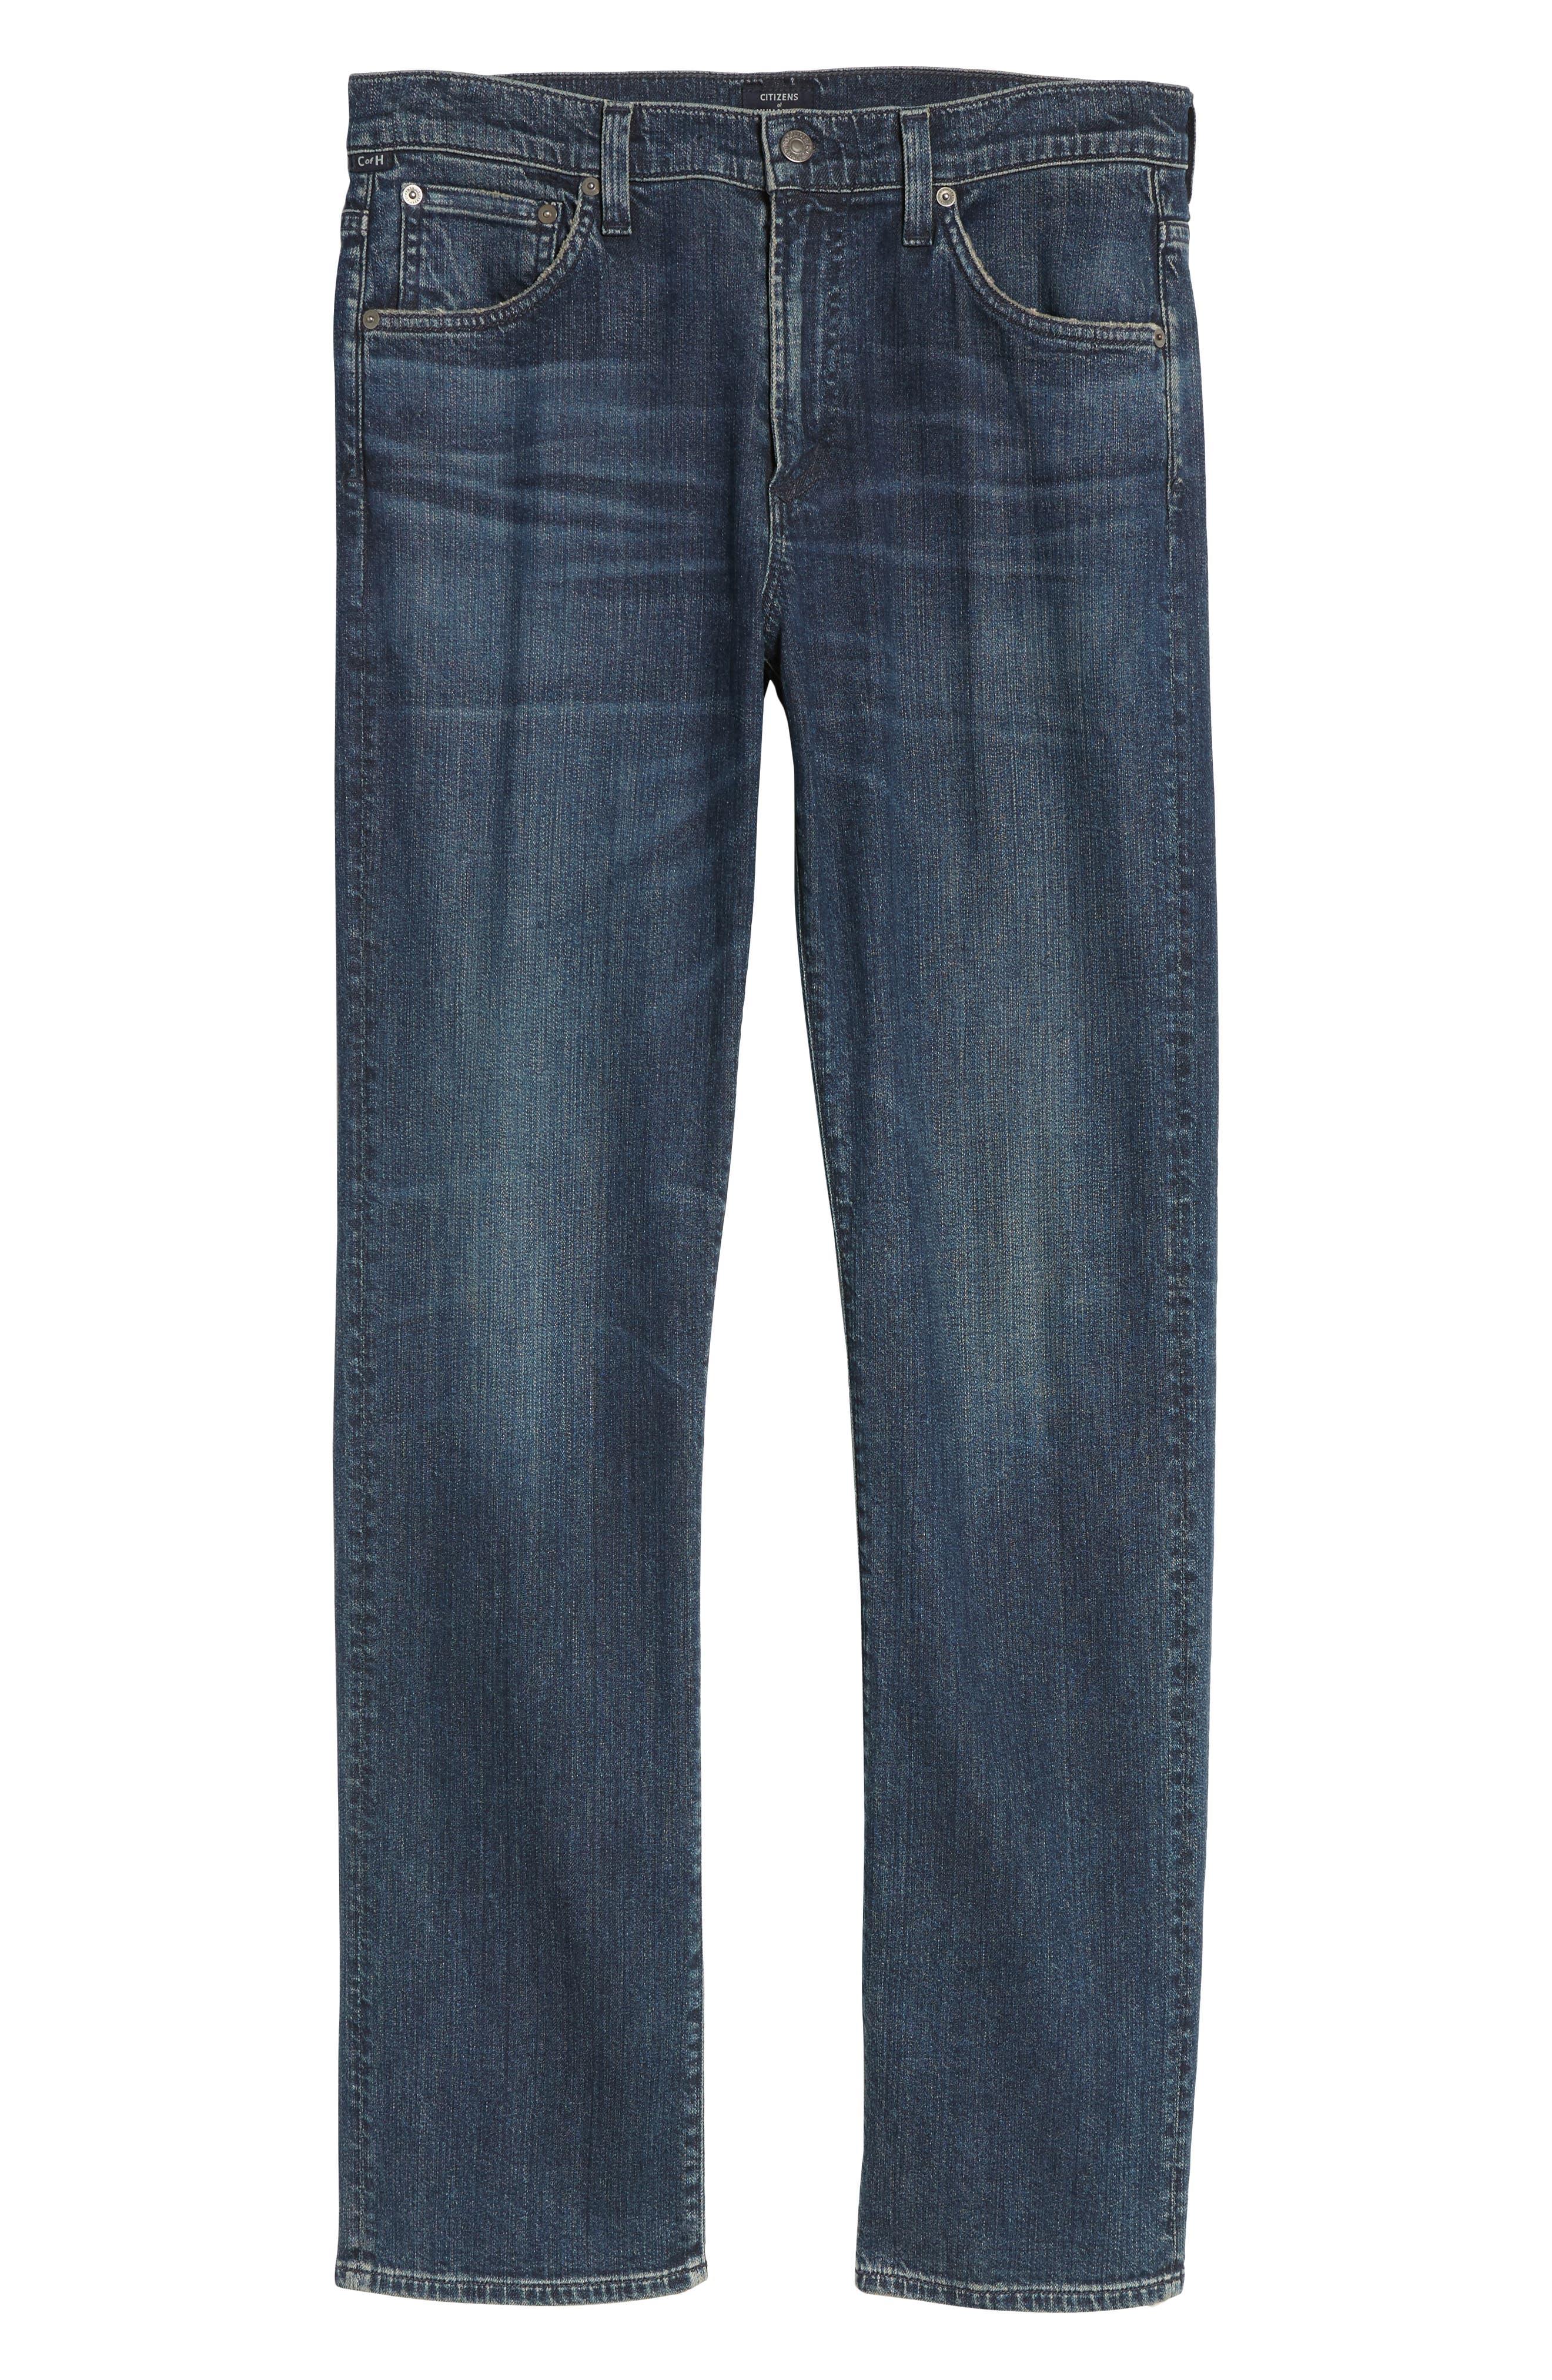 Sid Straight Leg Jeans,                             Alternate thumbnail 6, color,                             407